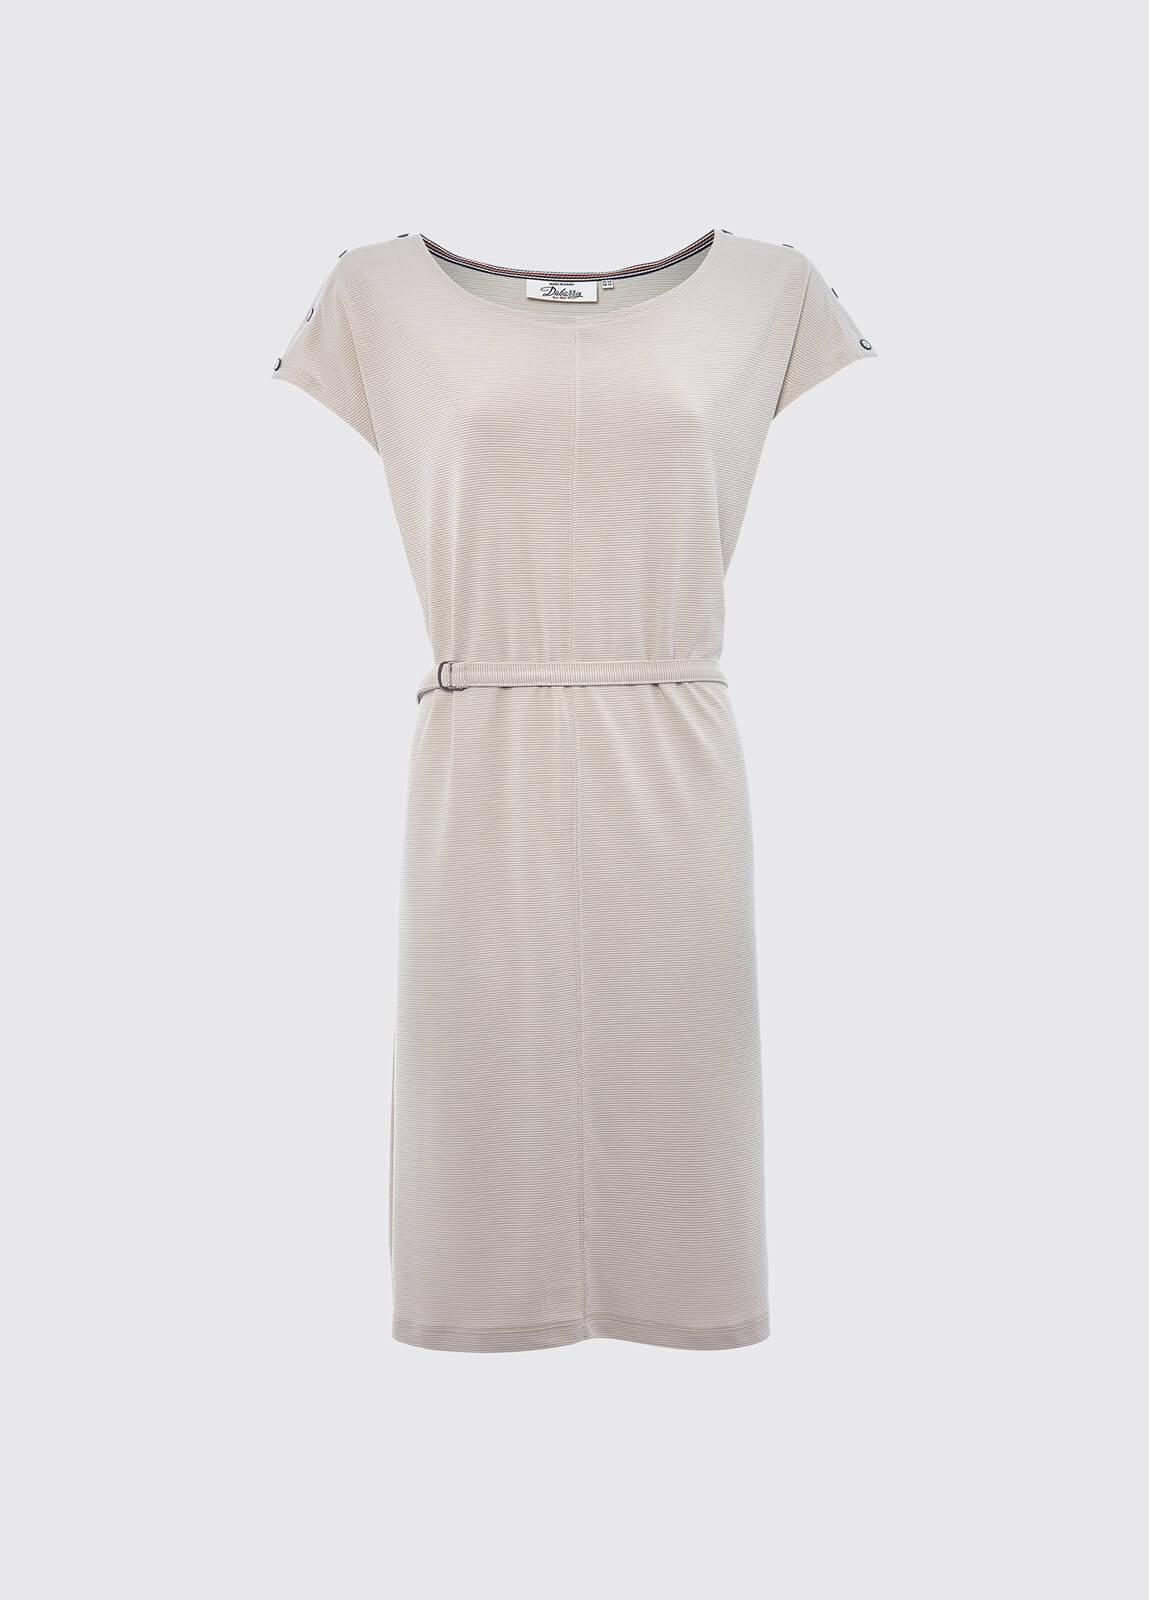 Kilcullen Dress - Oyster